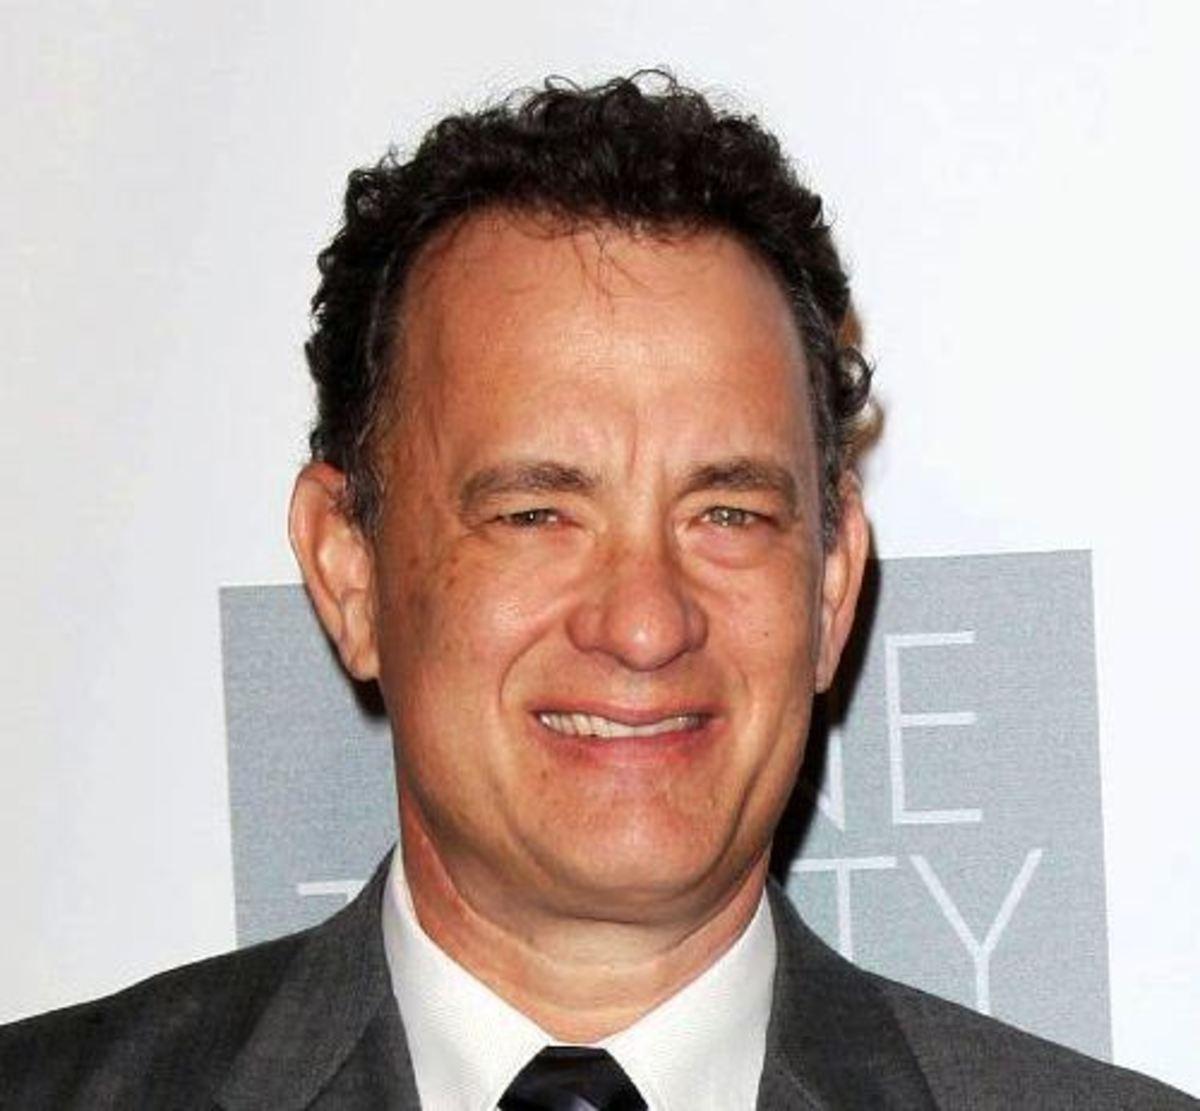 Splash launched Hank's movie career.